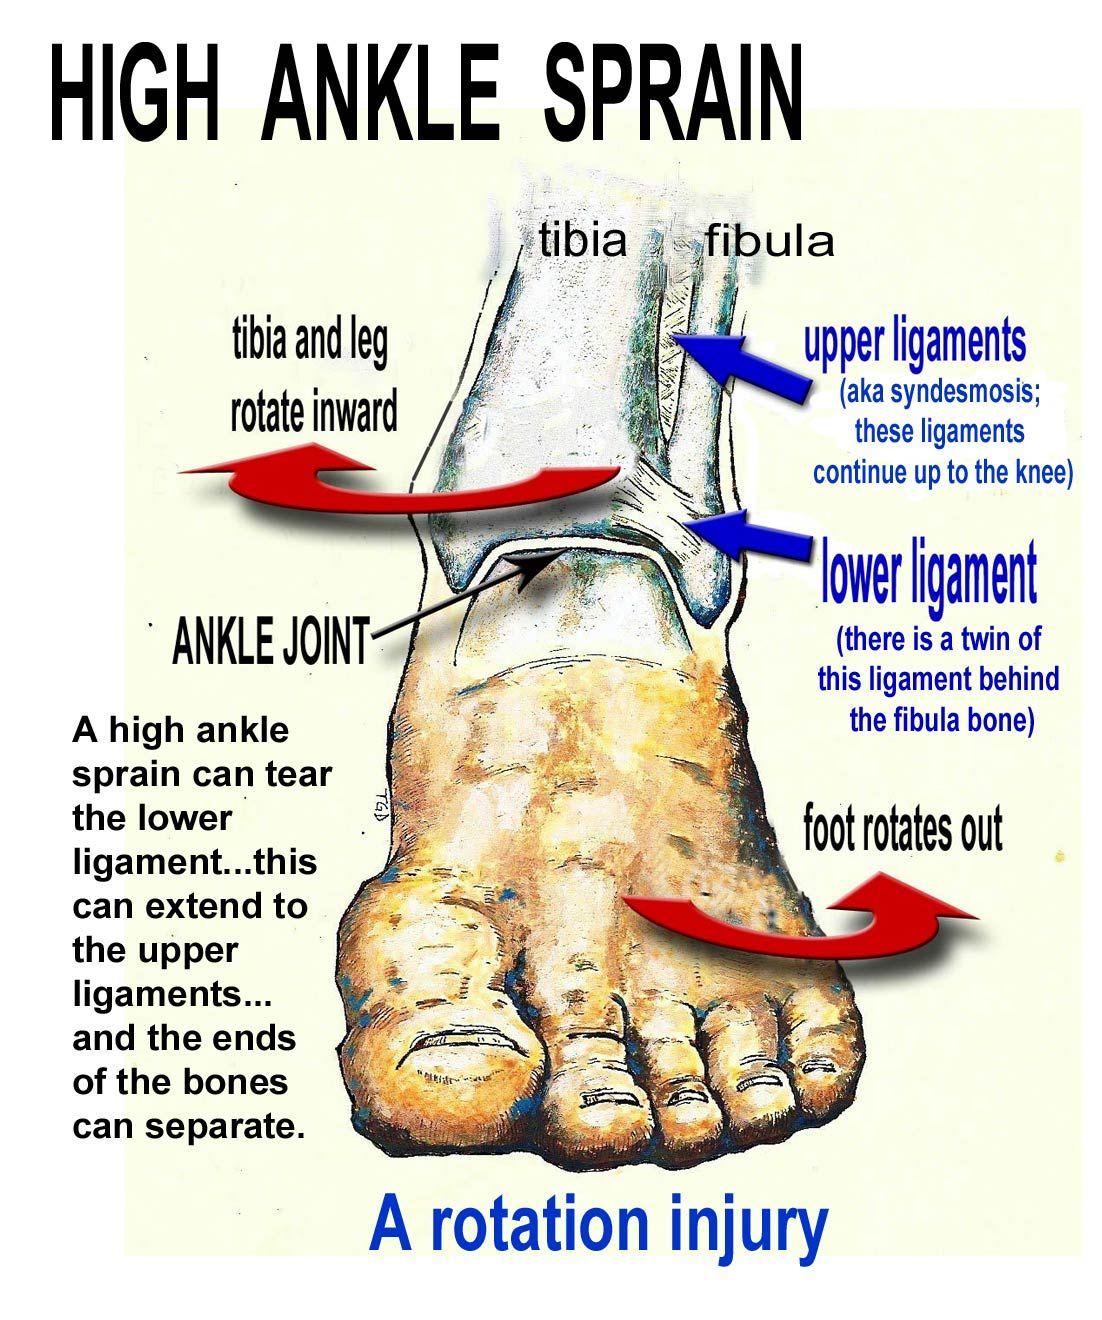 Lateral Foot Sprain - Podiatry, Orthopedics